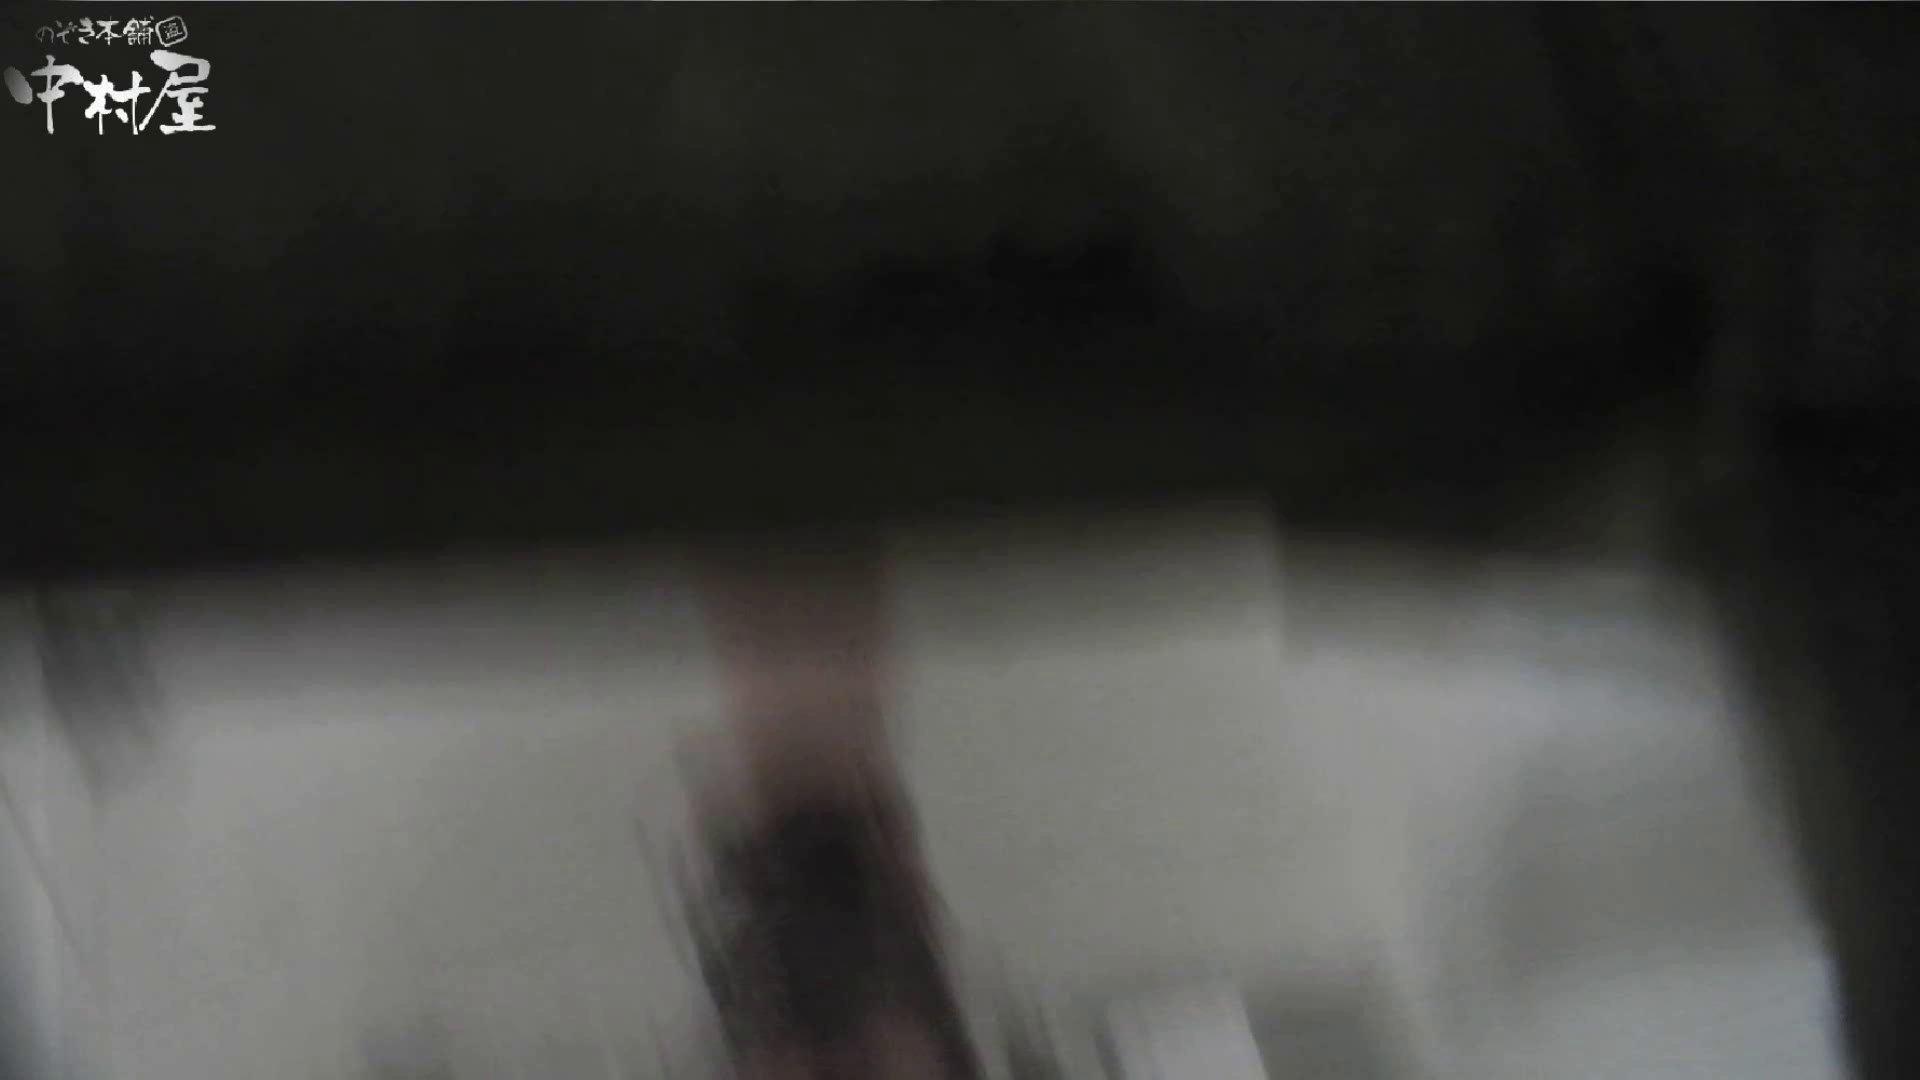 vol.47 命がけ潜伏洗面所! 可愛い顔してケツ毛な件 洗面所編  78PIX 9